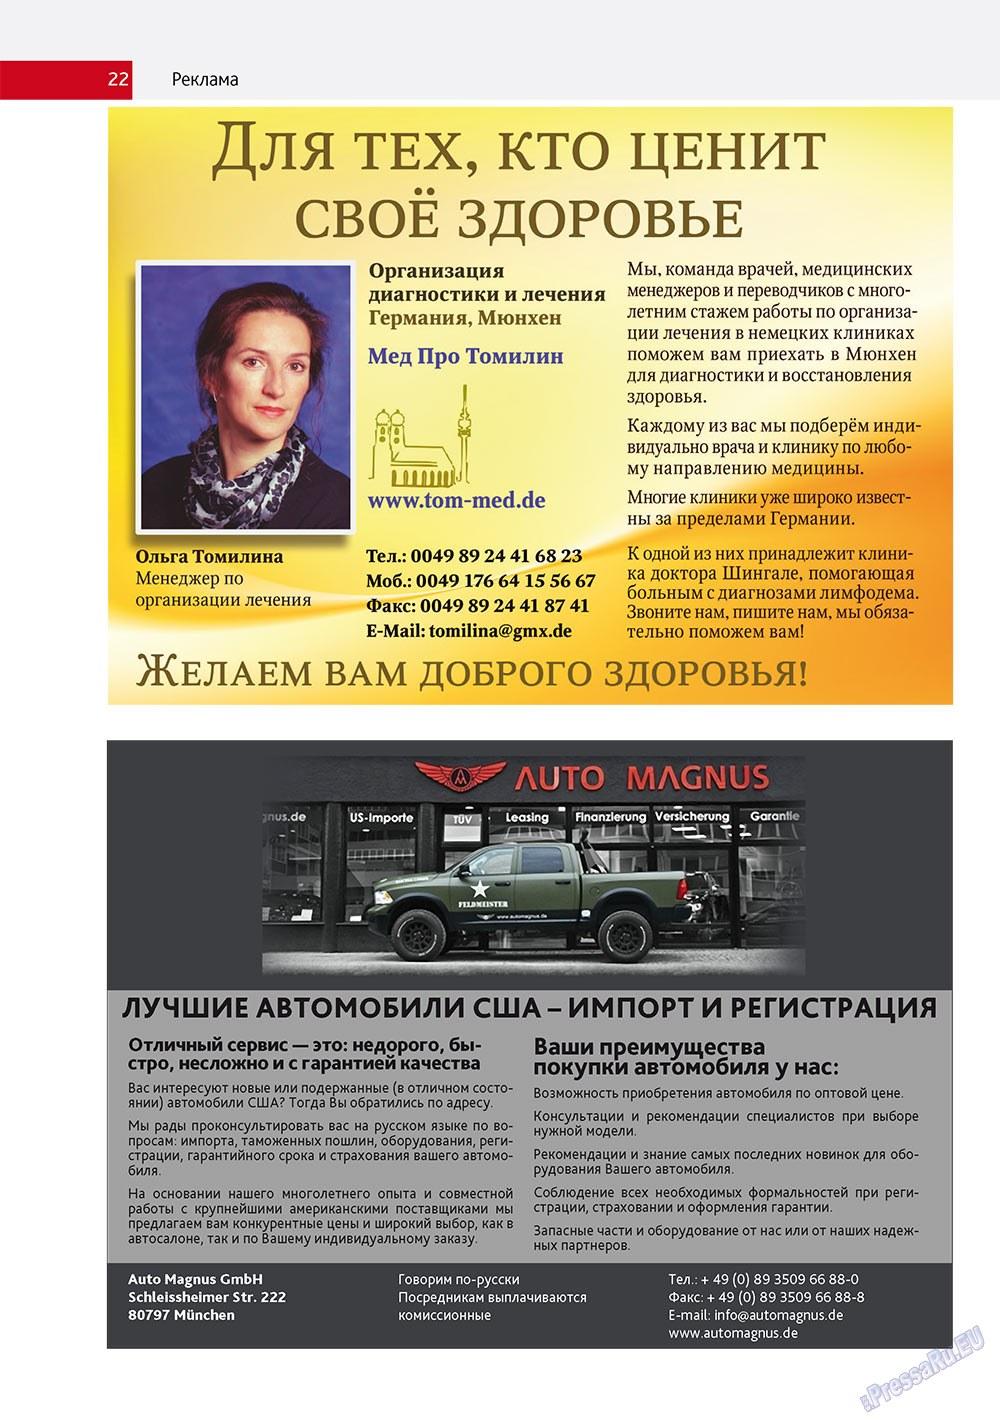 Бизнес парк (журнал). 2011 год, номер 5, стр. 22